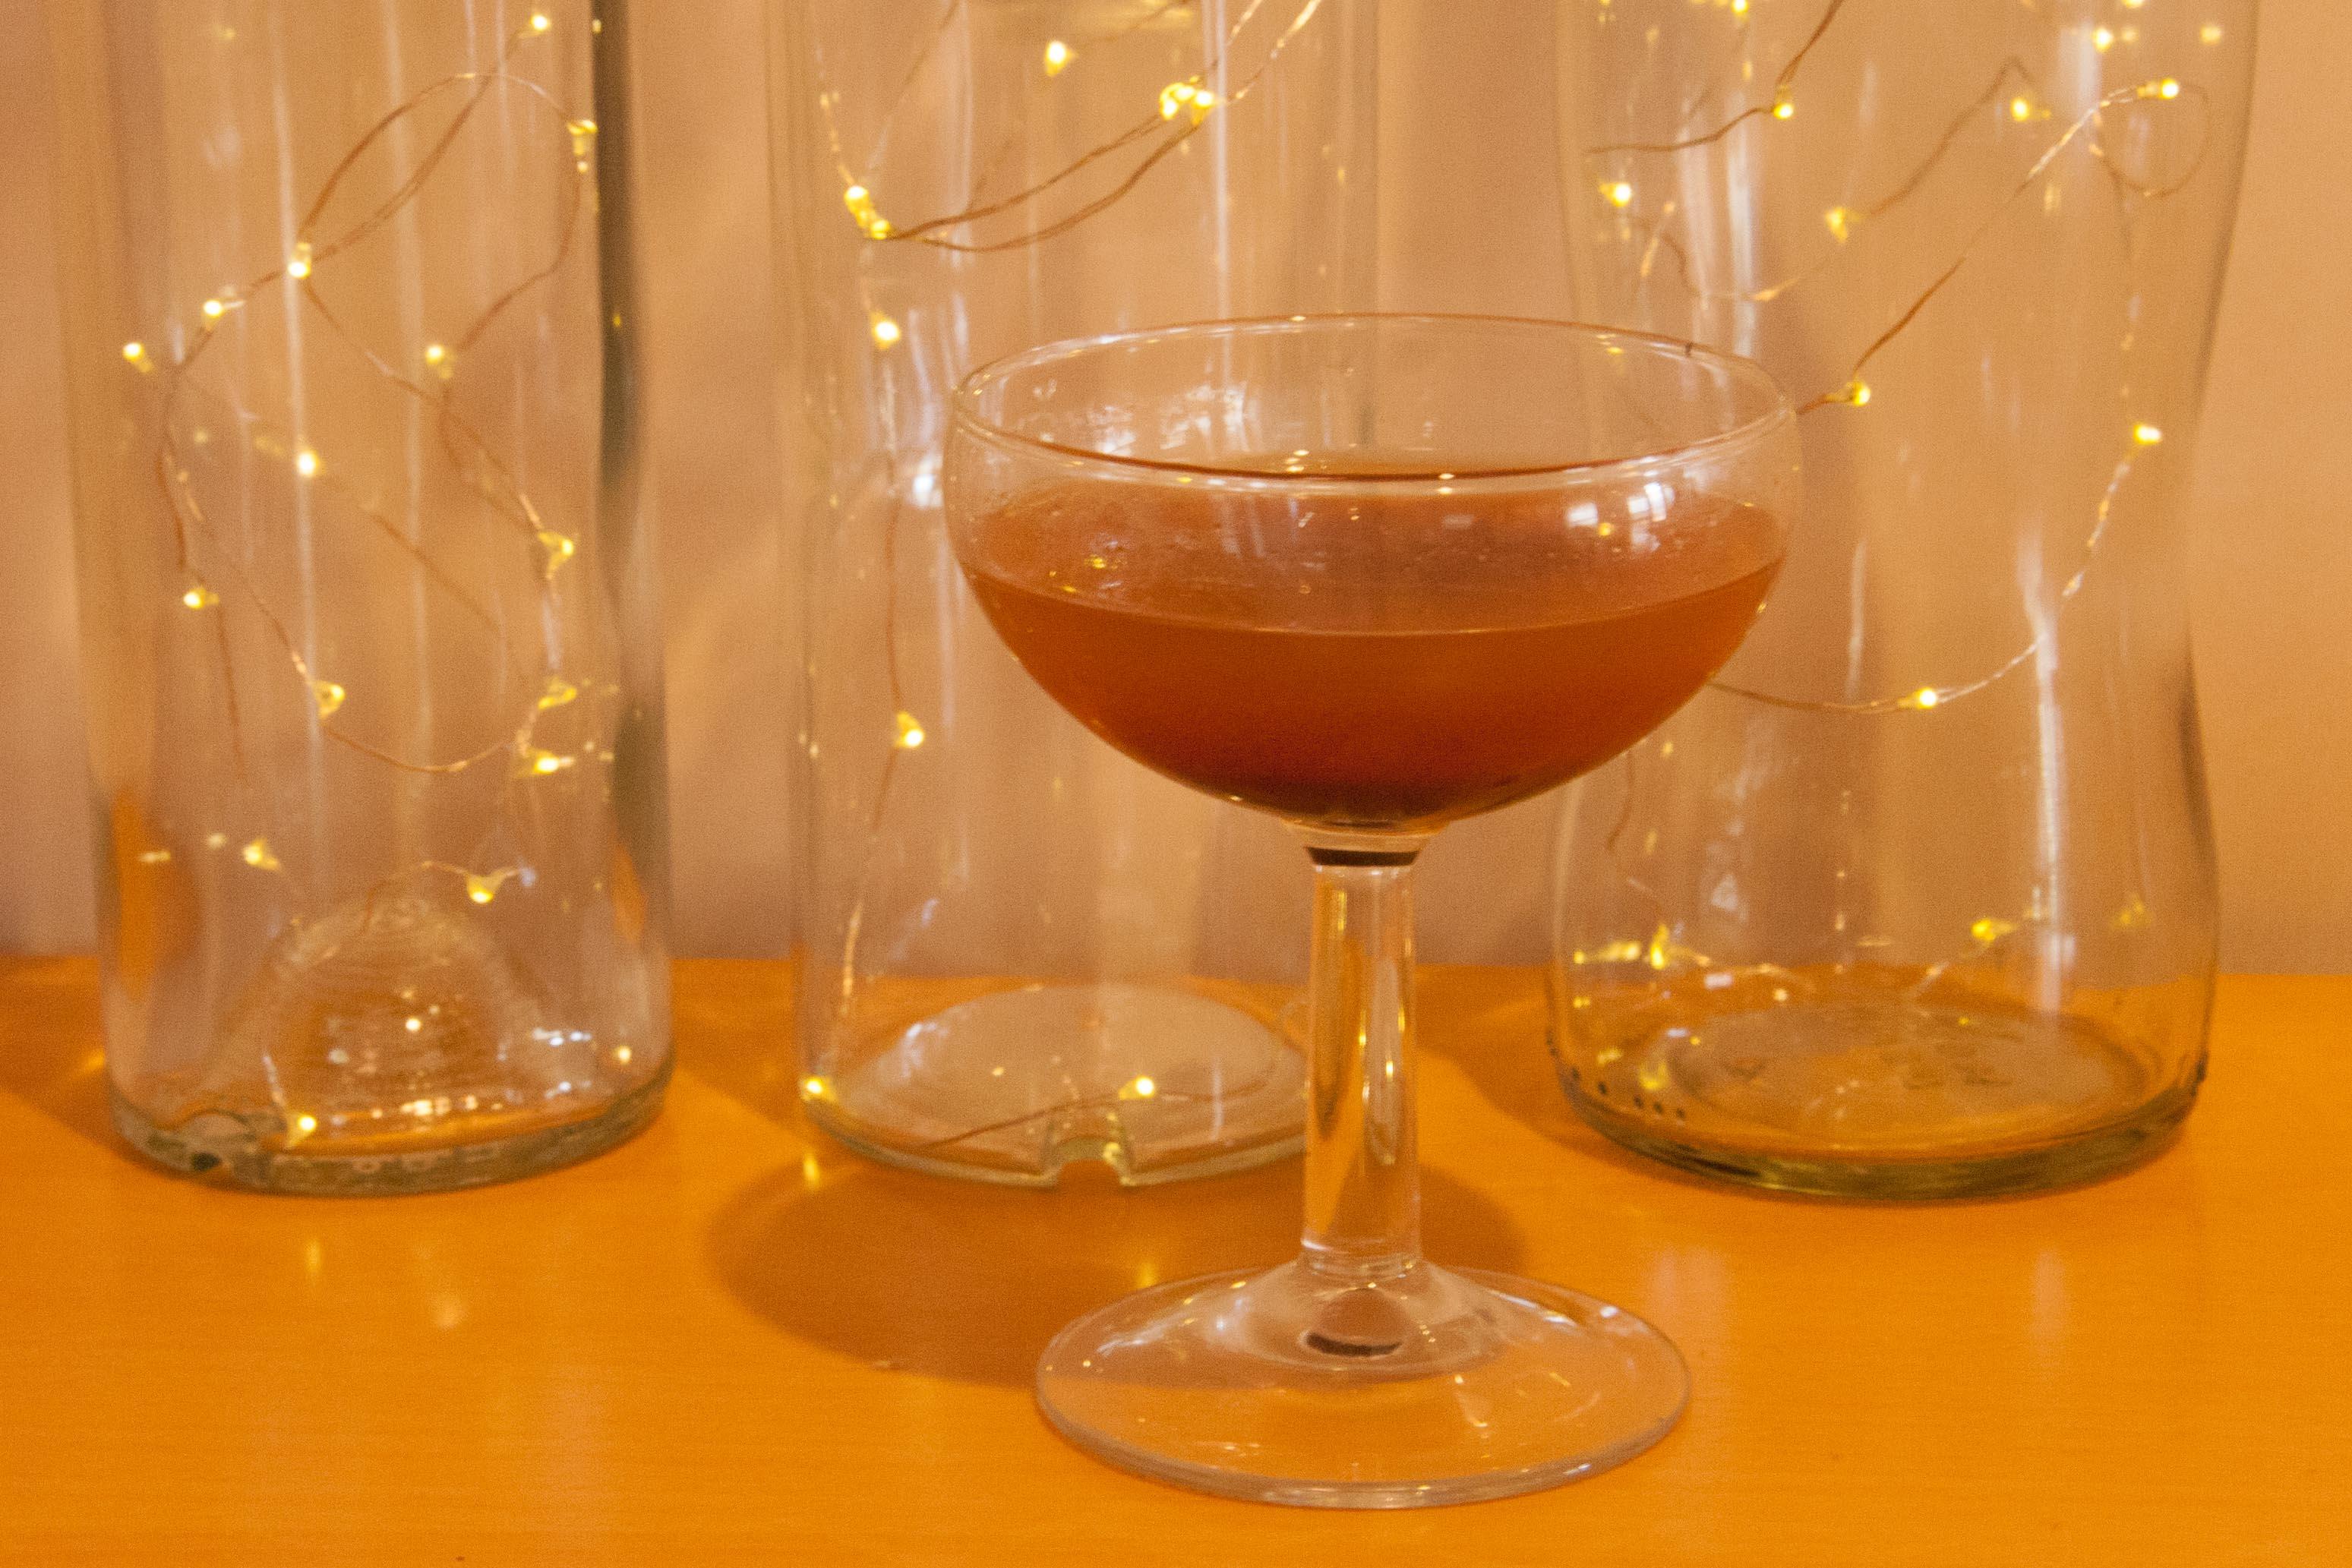 The Almond Joy: a Noyaux Cocktail